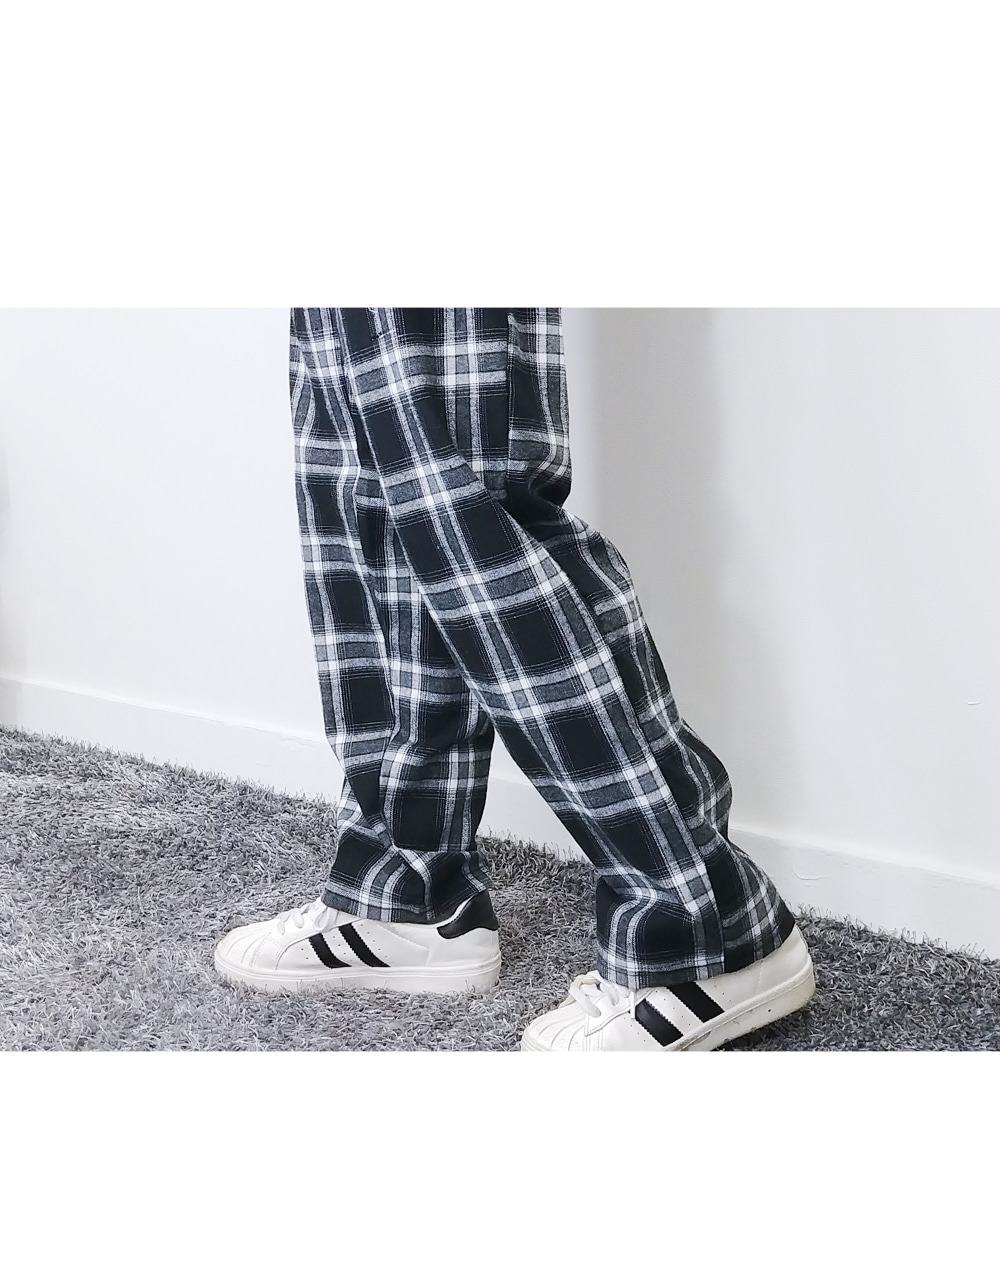 Lucas Bending Square Check Pants